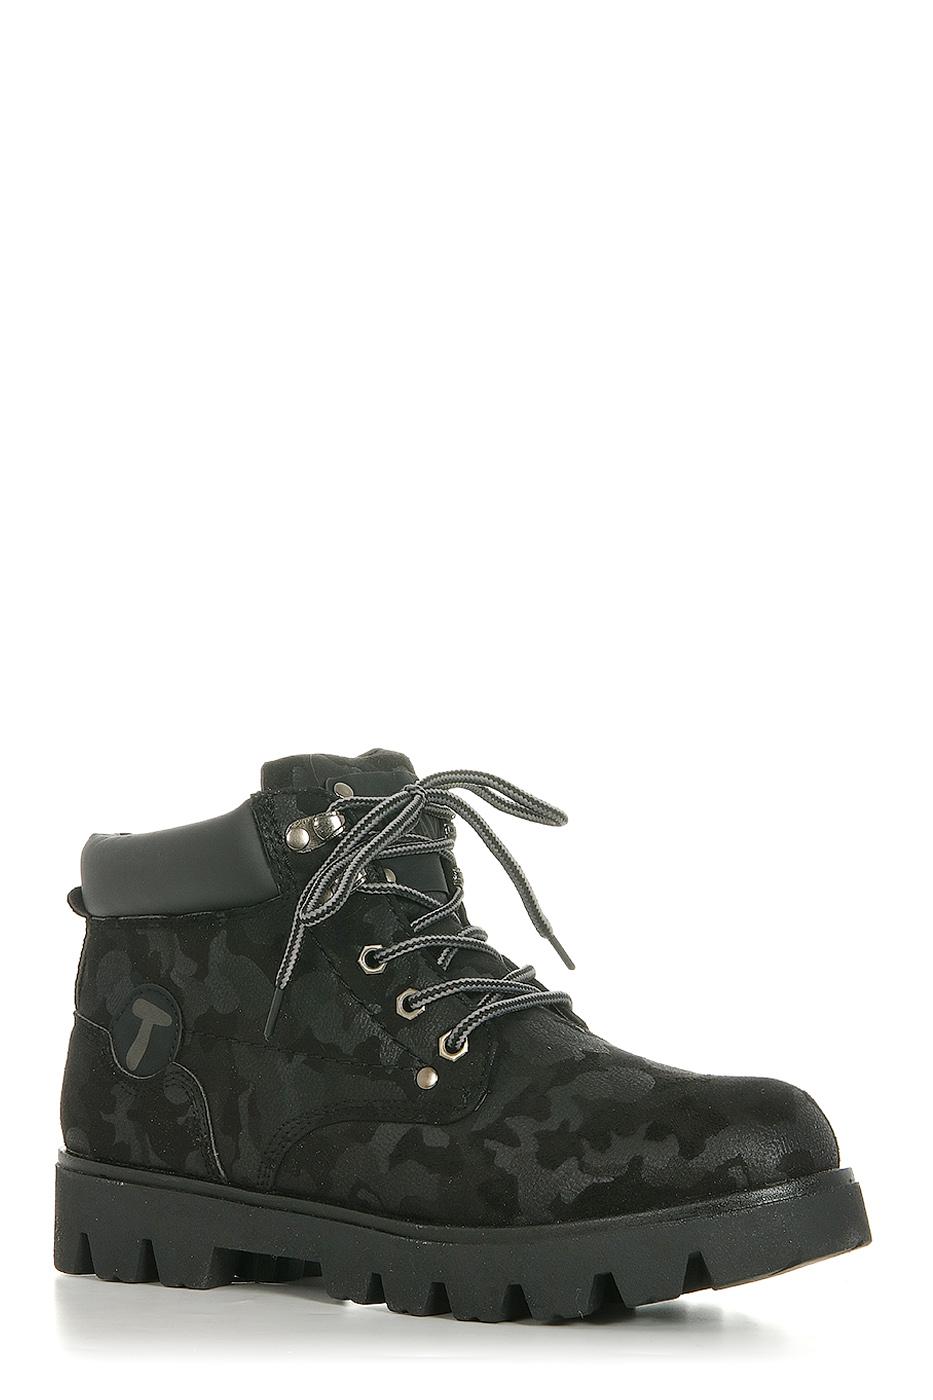 Ботинки TOPLAND2352-PB76264B/BLACK